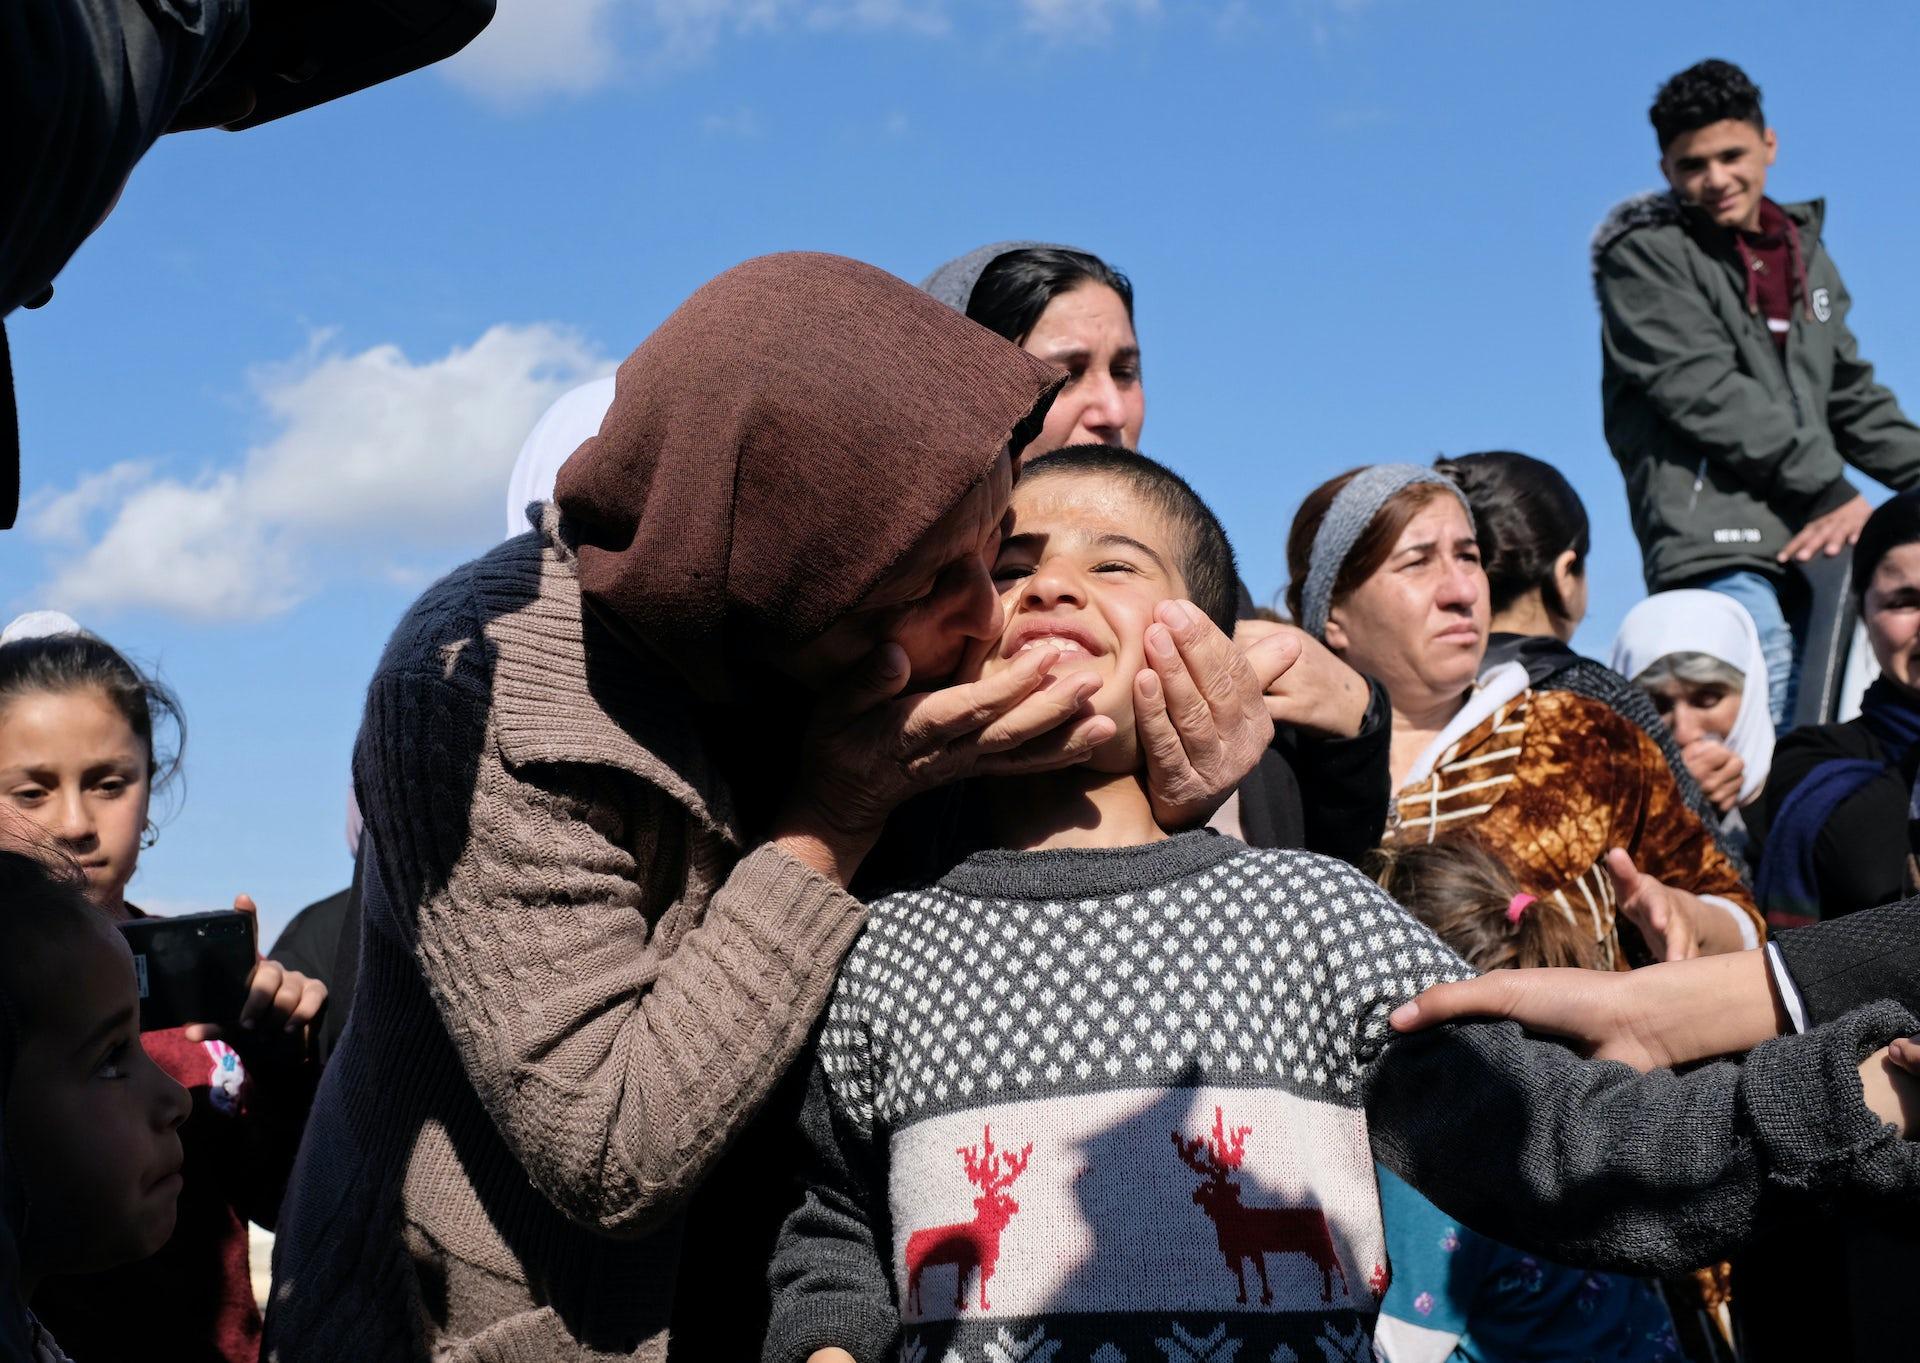 5 Years After Islamic State Massacre, an Iraqi Minority Is Transformed by Trauma